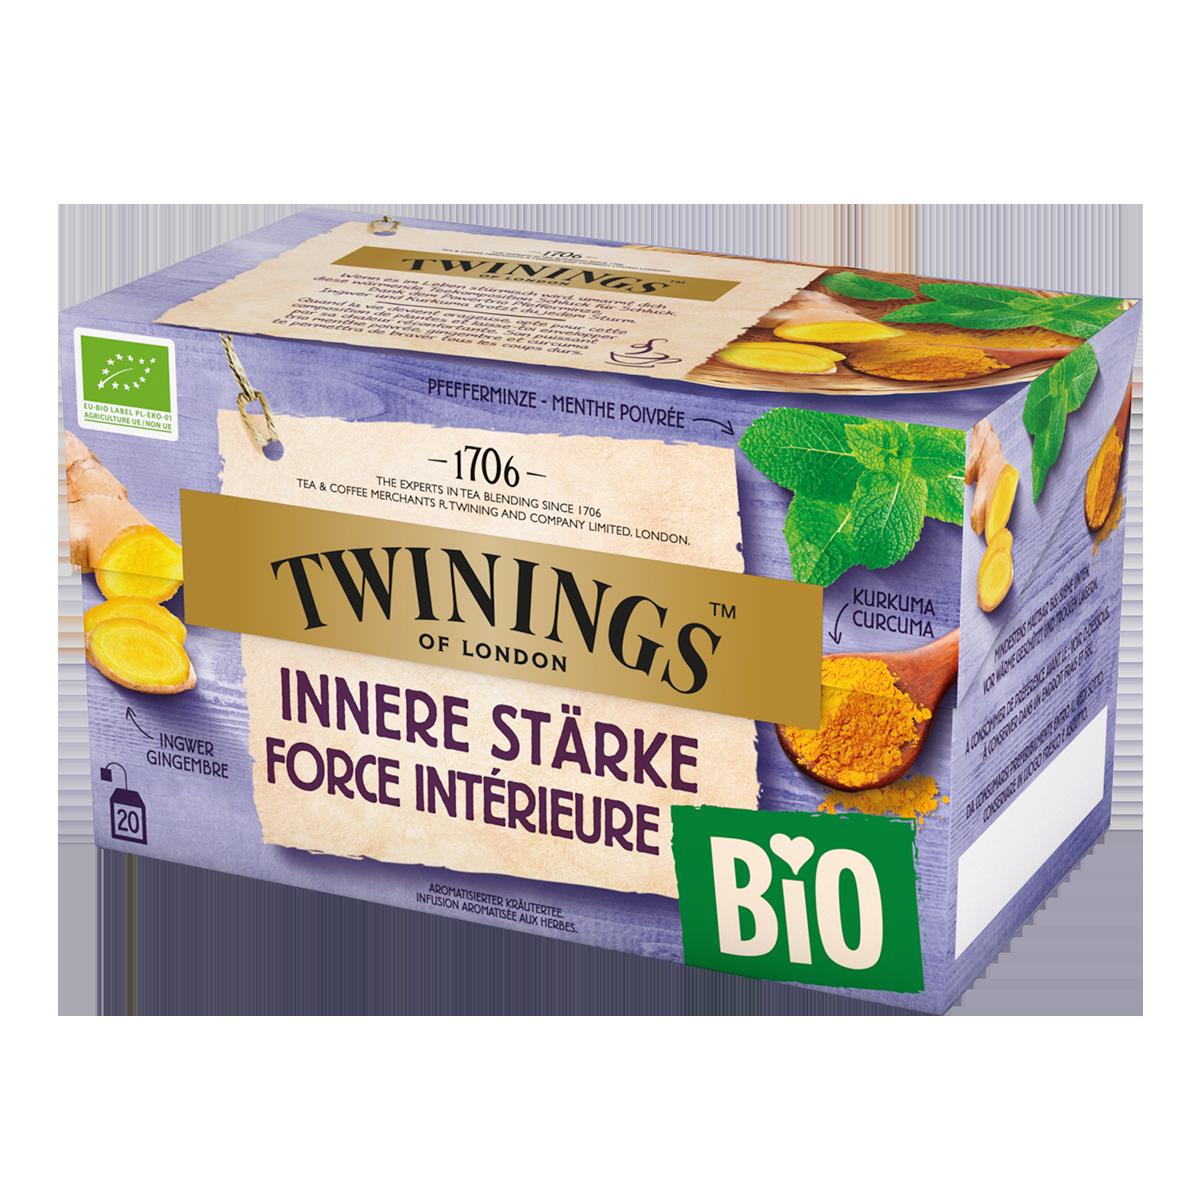 Twinings Bio Force Interieure 40g